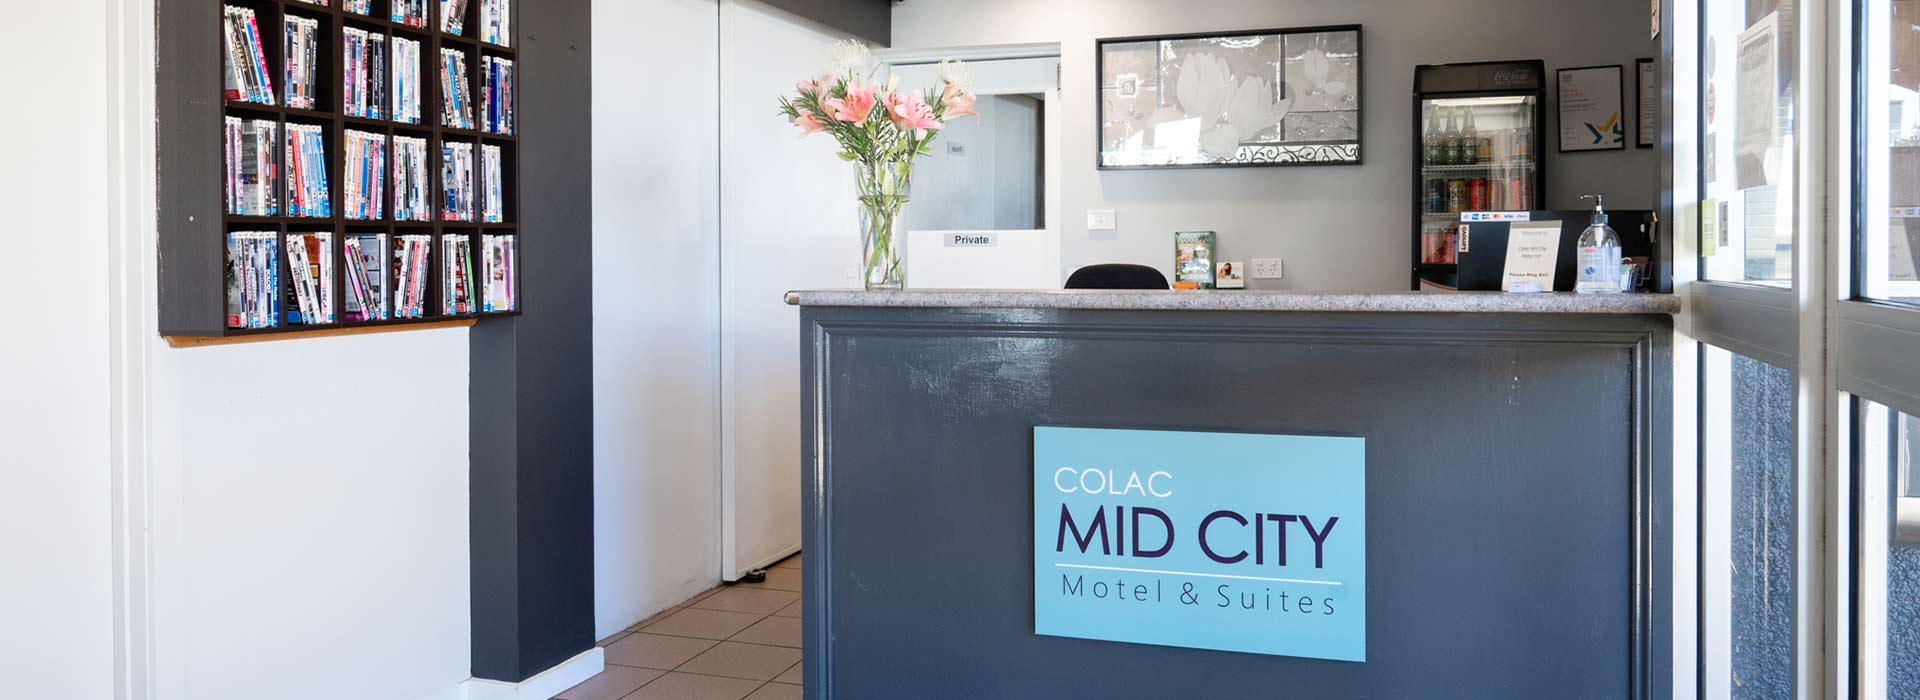 Colac Mid City Motel